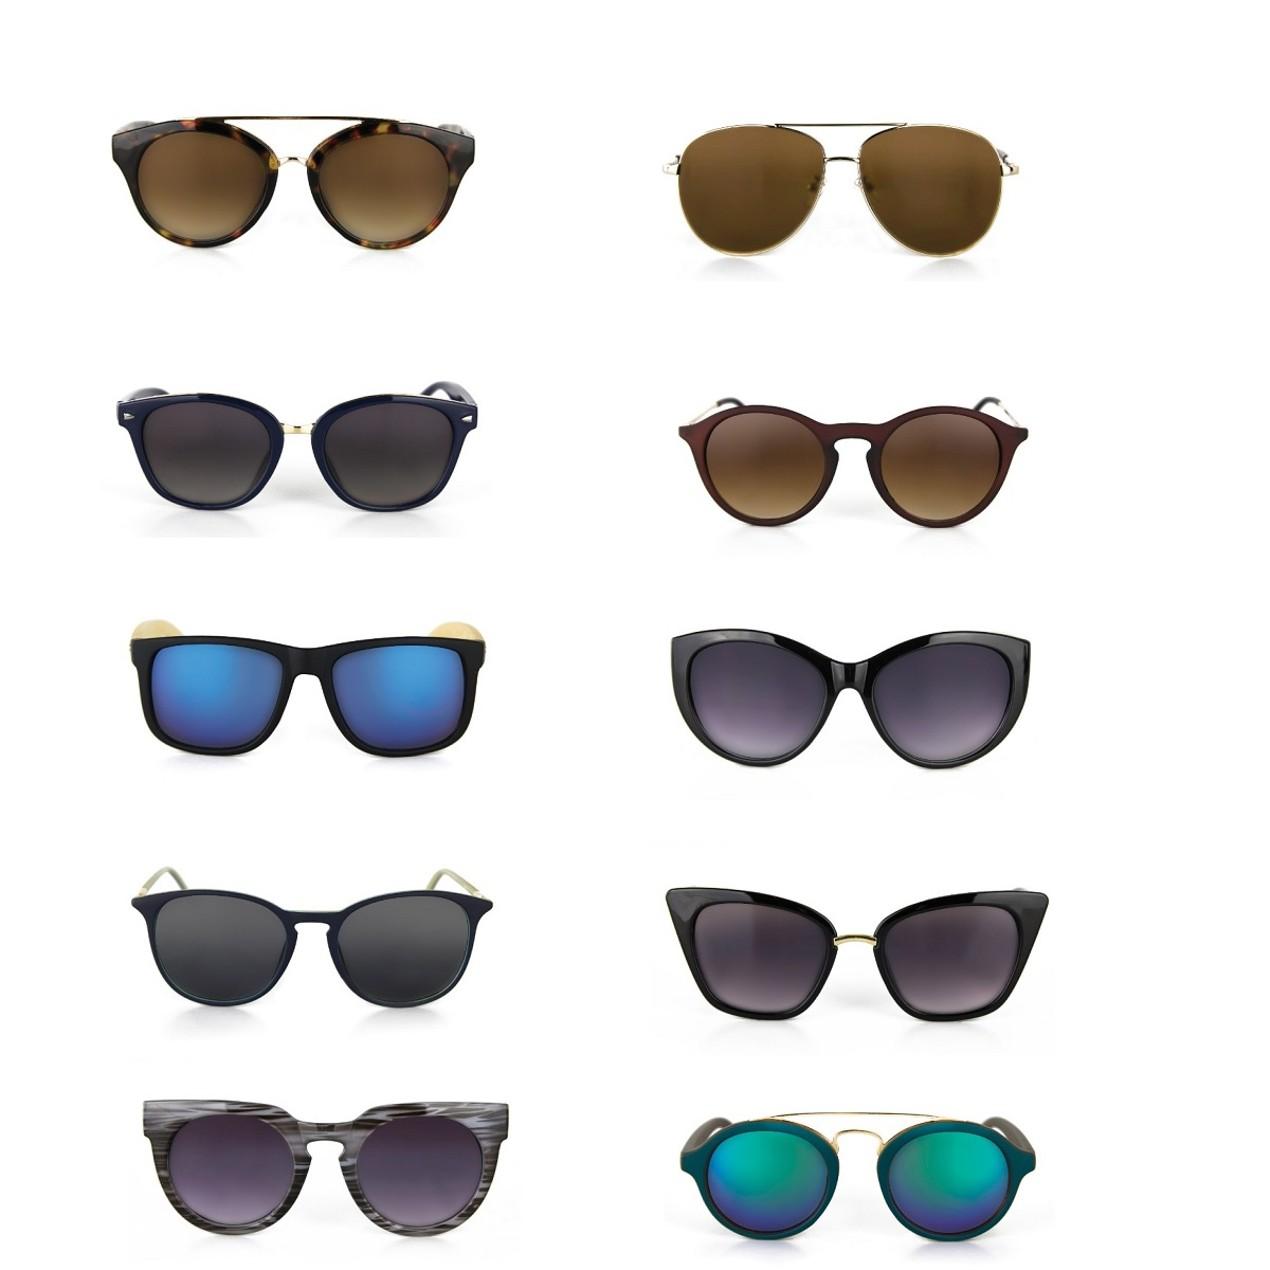 d7725860dc4 Buy One Get One Free Optimum Optical Sunglasses - Tanga